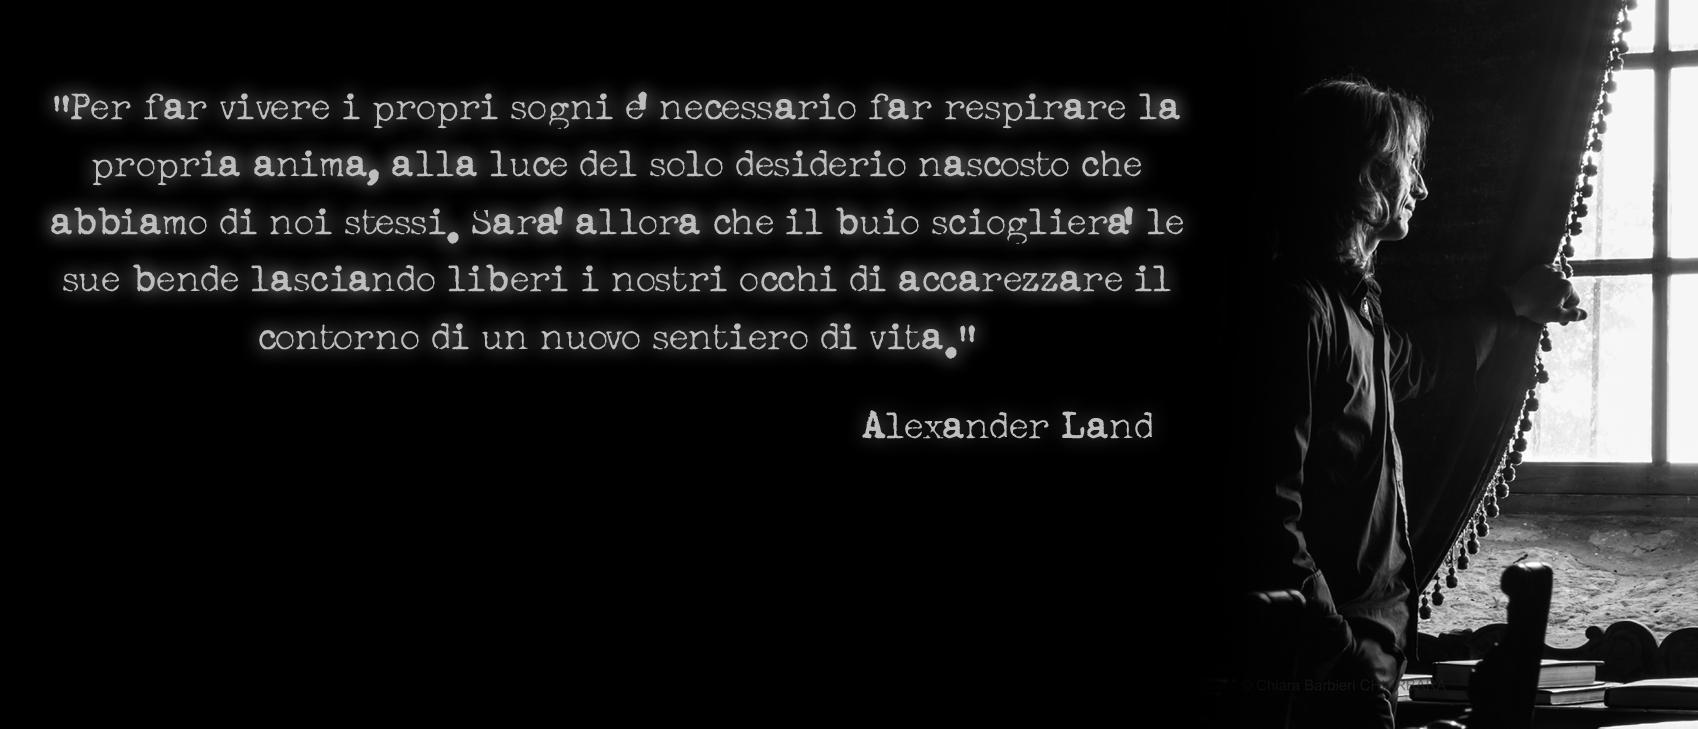 Alexander Land